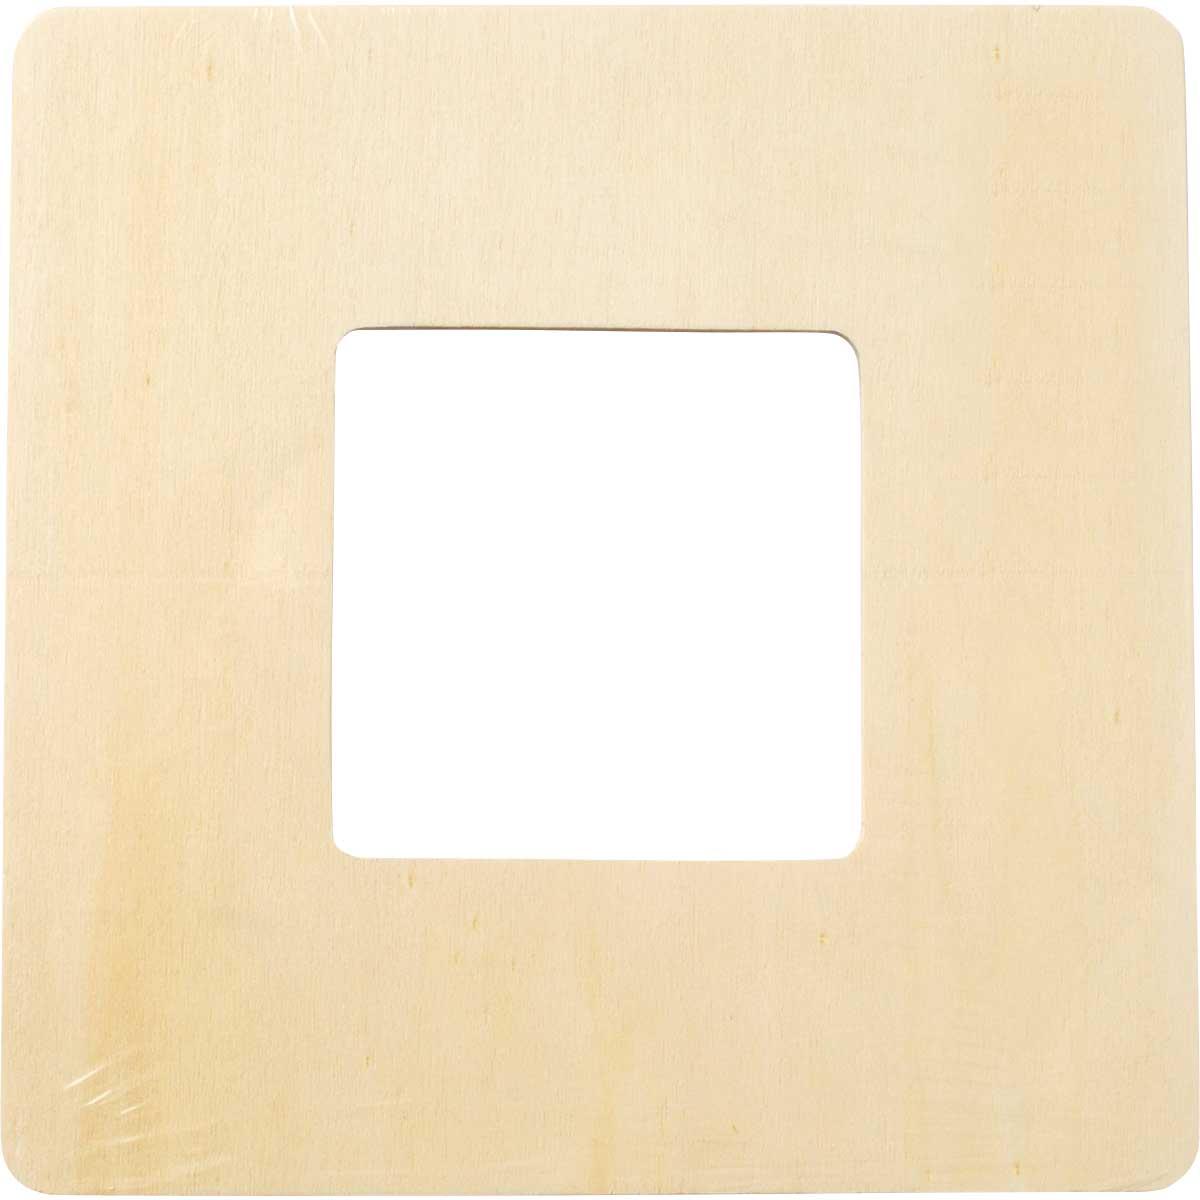 Plaid ® Wood Surfaces - Frames - Square